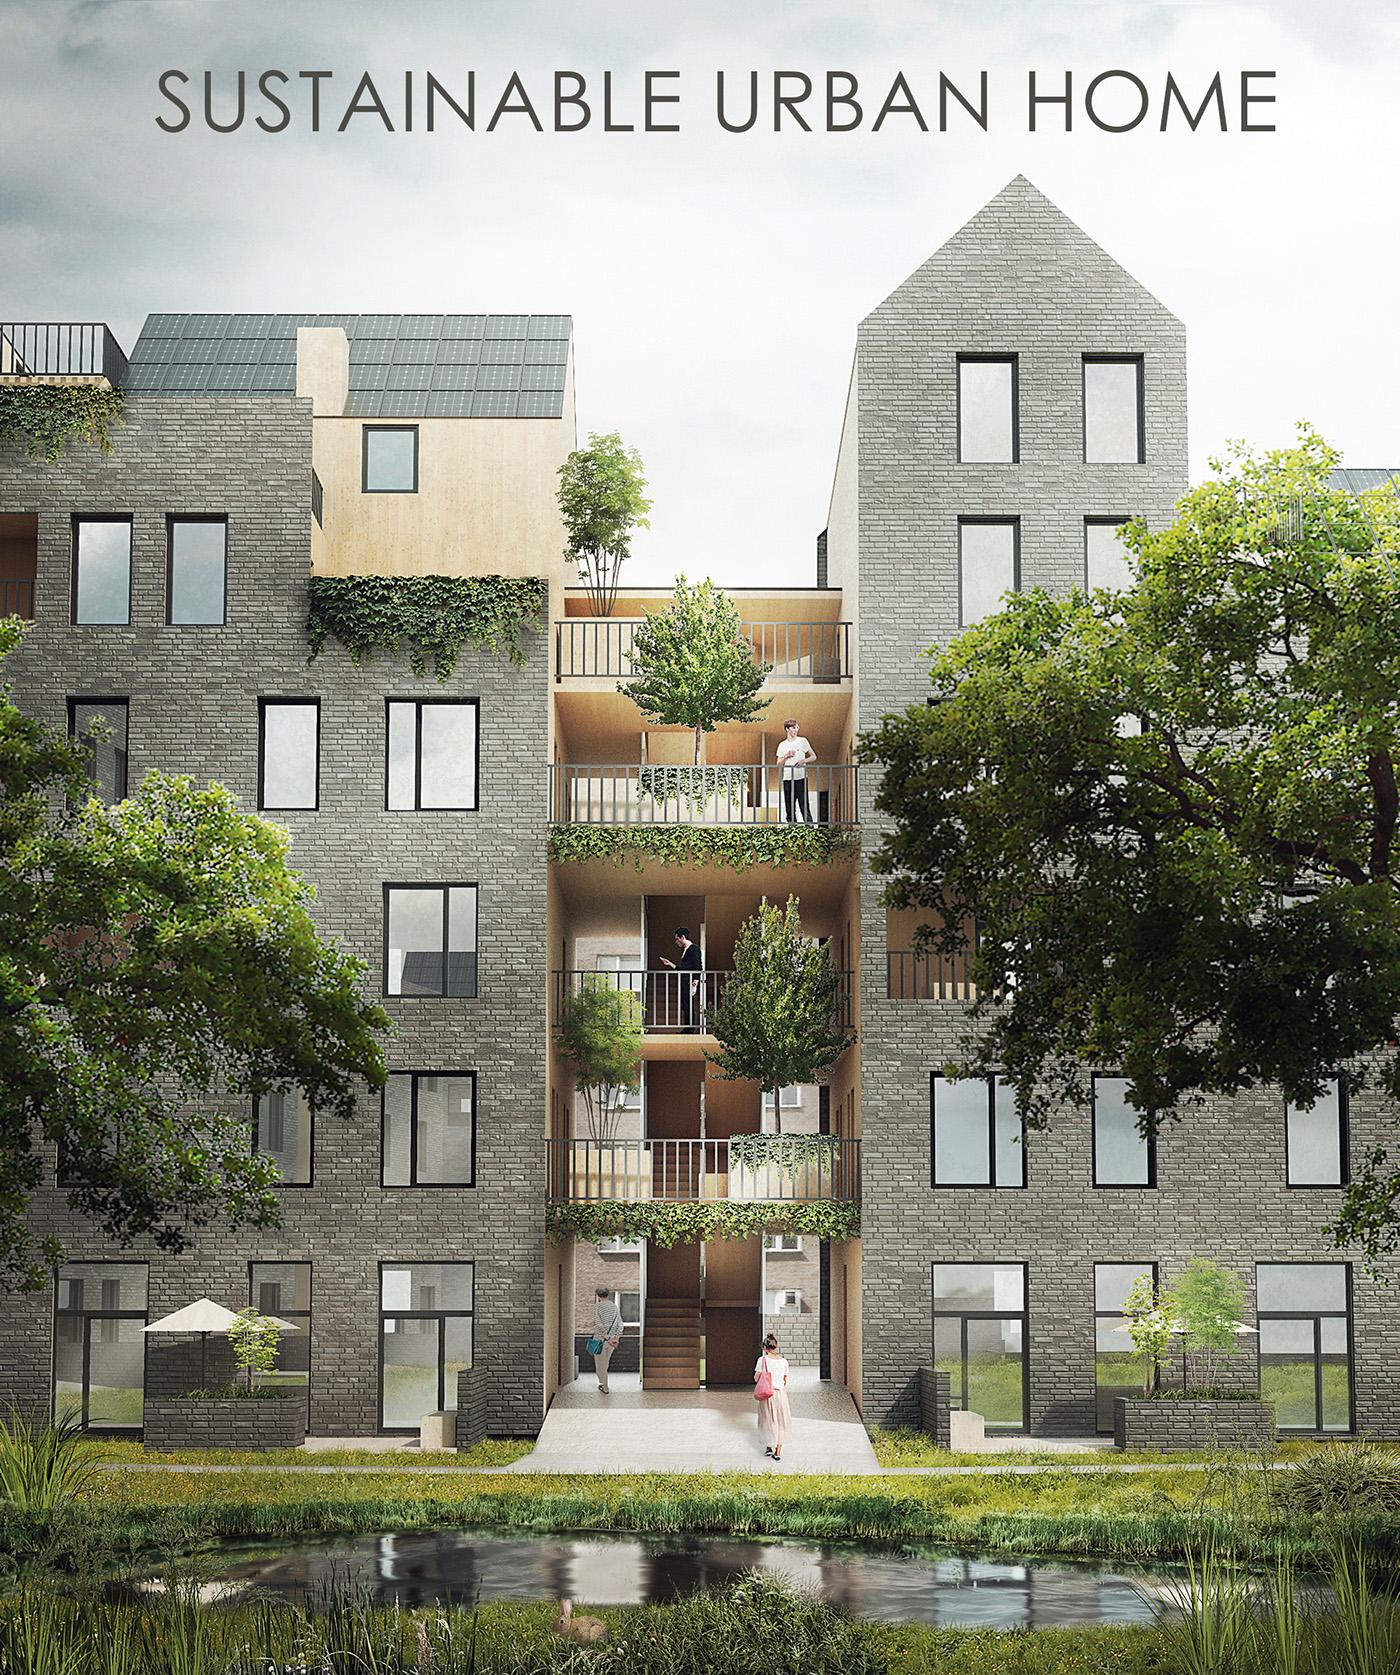 Eco Urban Home In Seattle Washington: Sustainable Urban Home On Behance